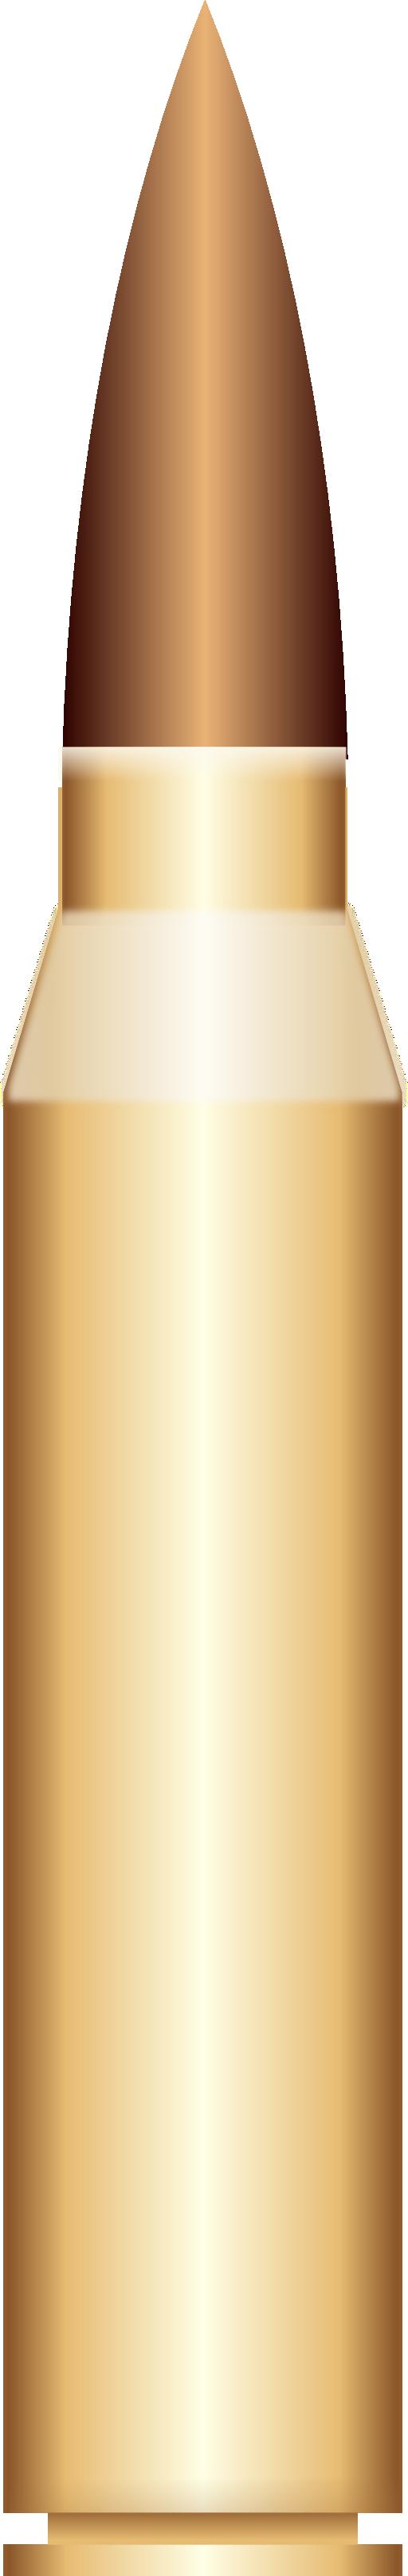 Bullet Clipart-bullet clipart-0